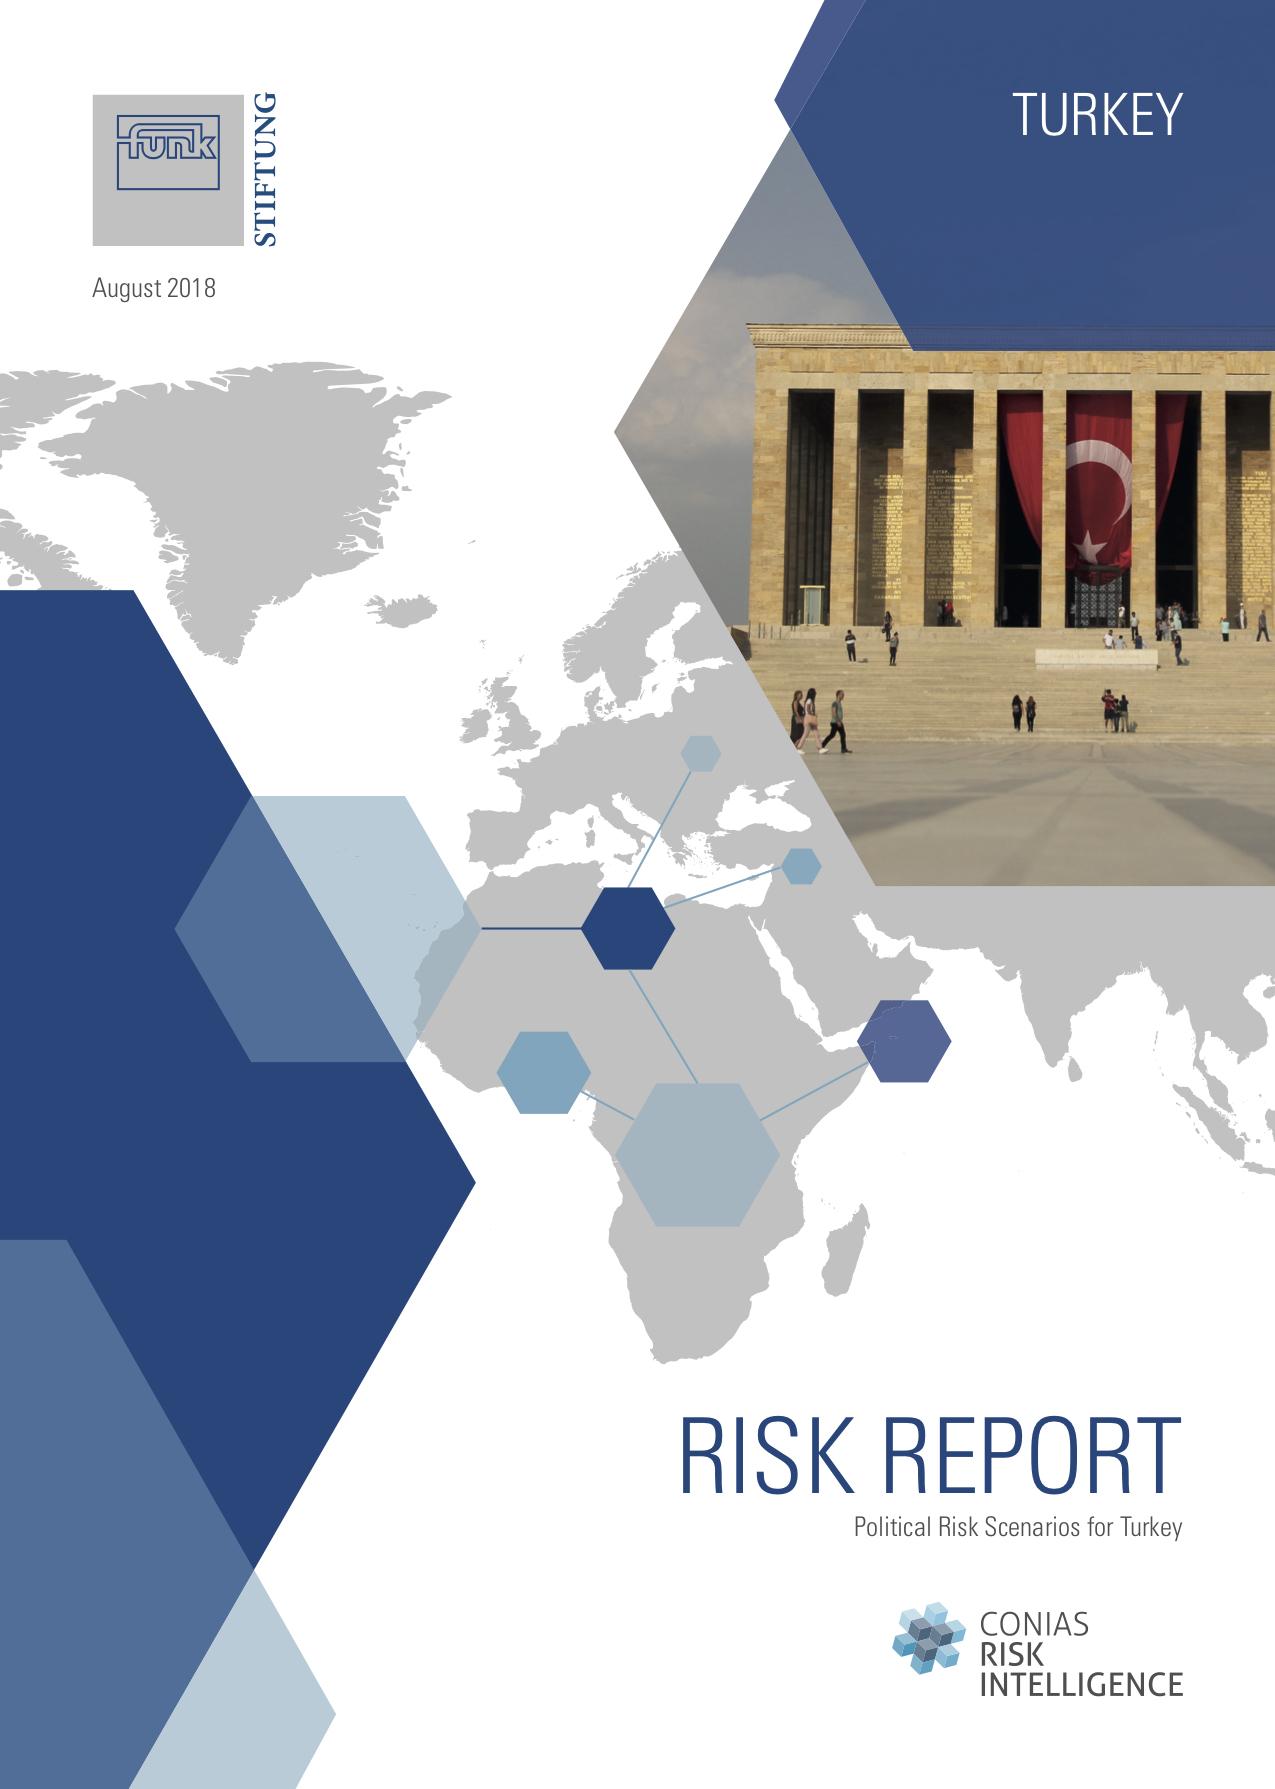 Risk Report Turkey